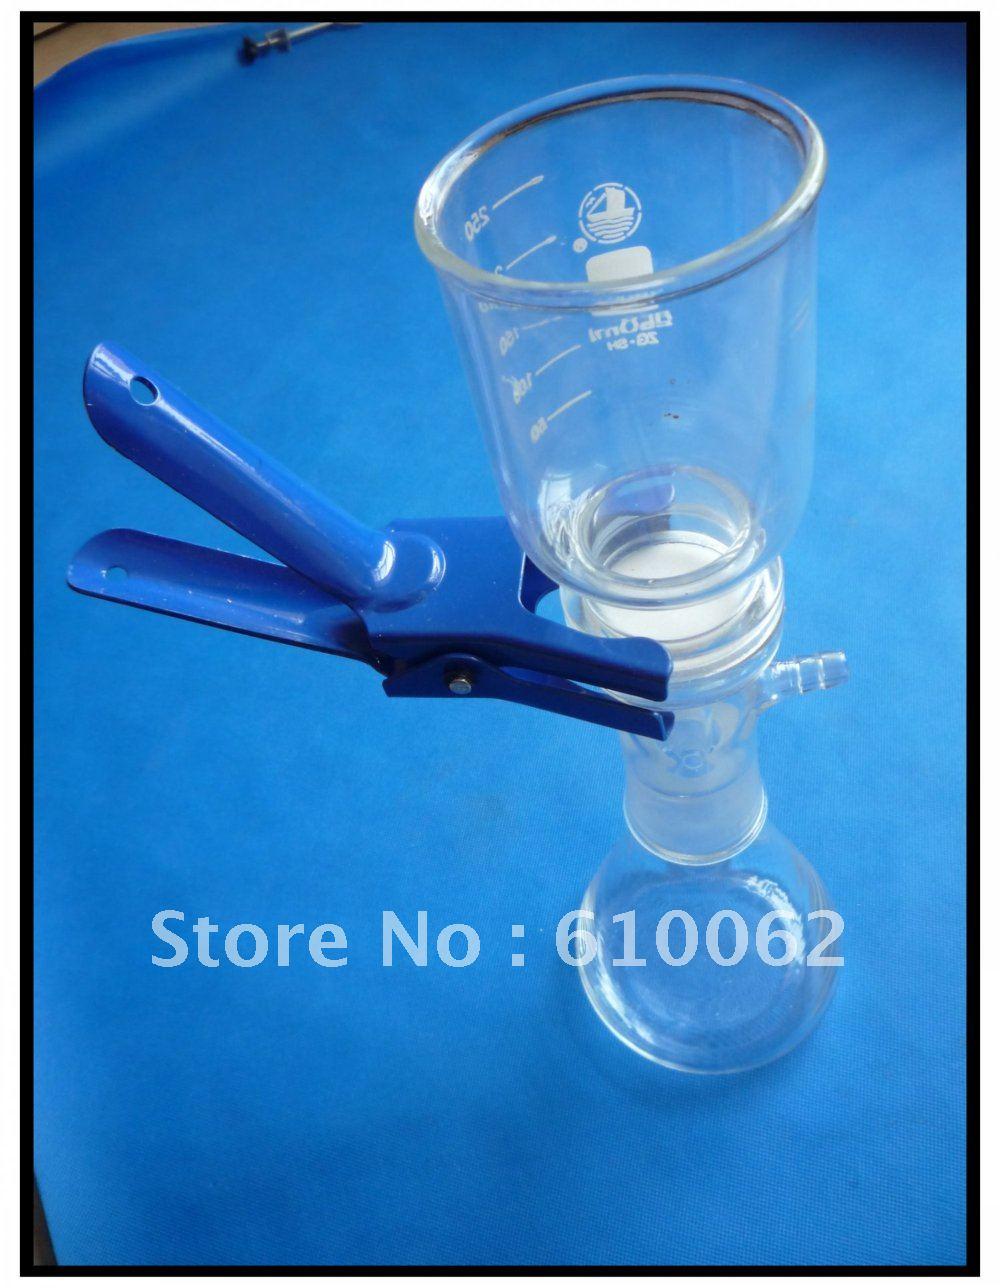 Vacuum Suction Filter Device, Buchner Filting Apparatus, with filter flask 500mlVacuum Suction Filter Device, Buchner Filting Apparatus, with filter flask 500ml